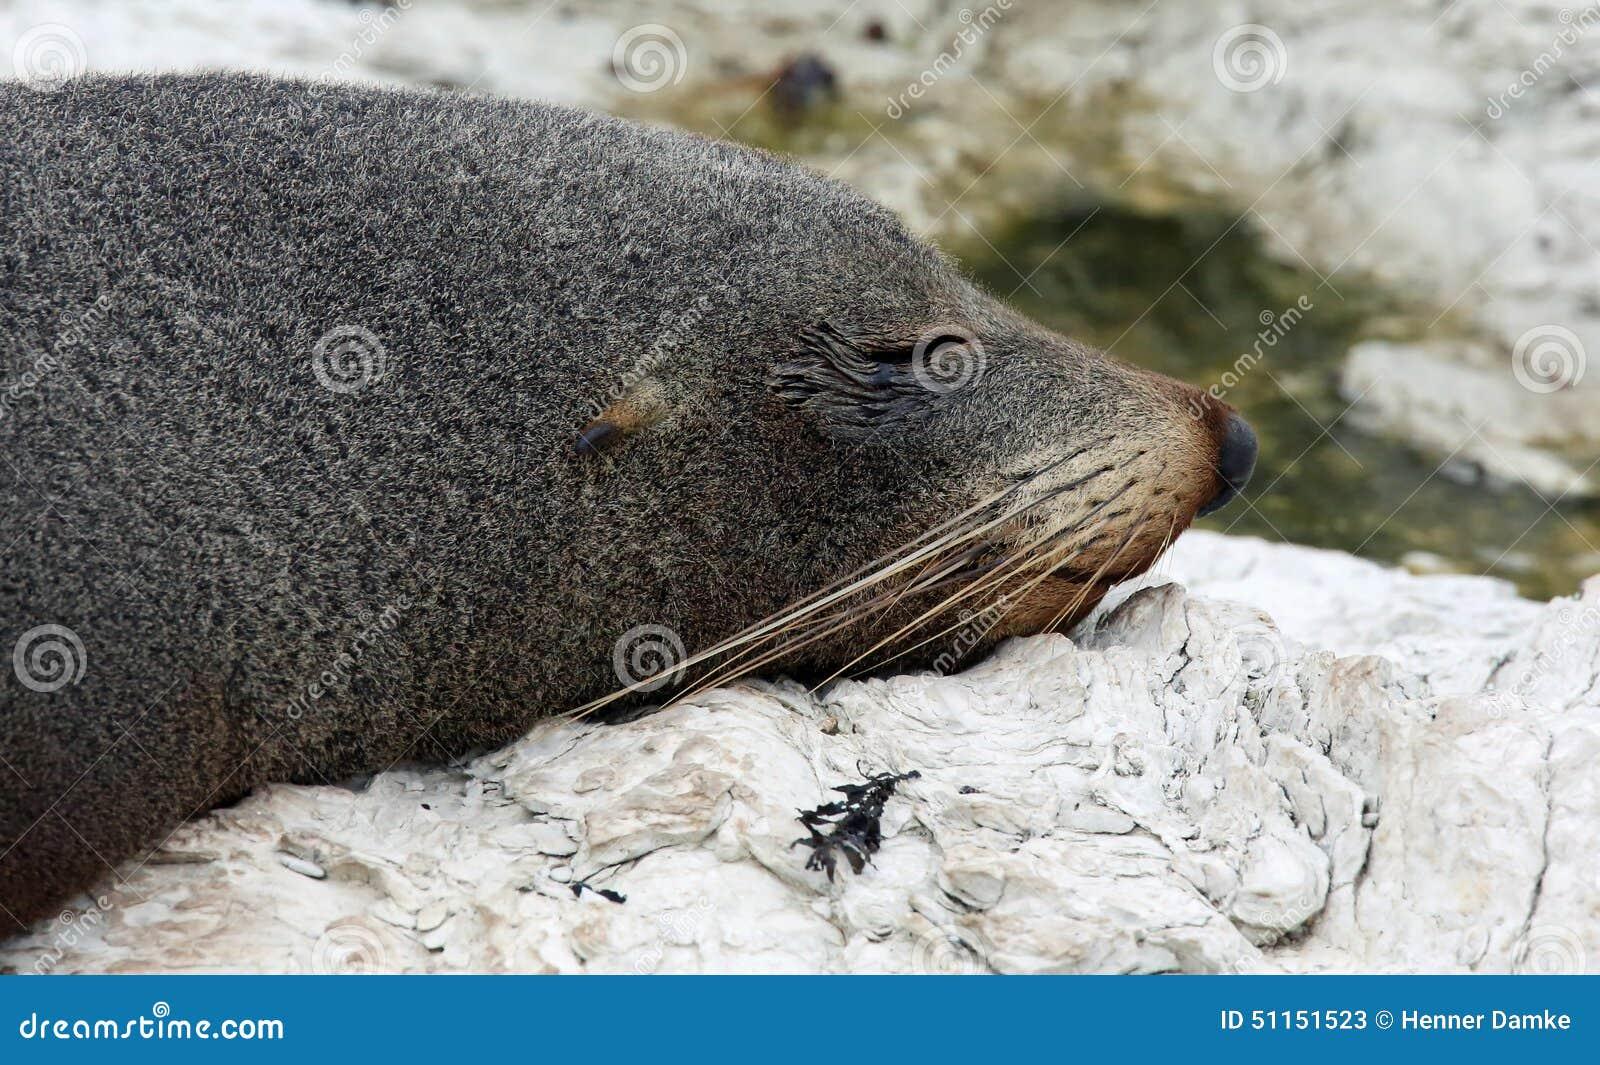 New Zealand Fur Seal near Kaikoura (New Zealand)